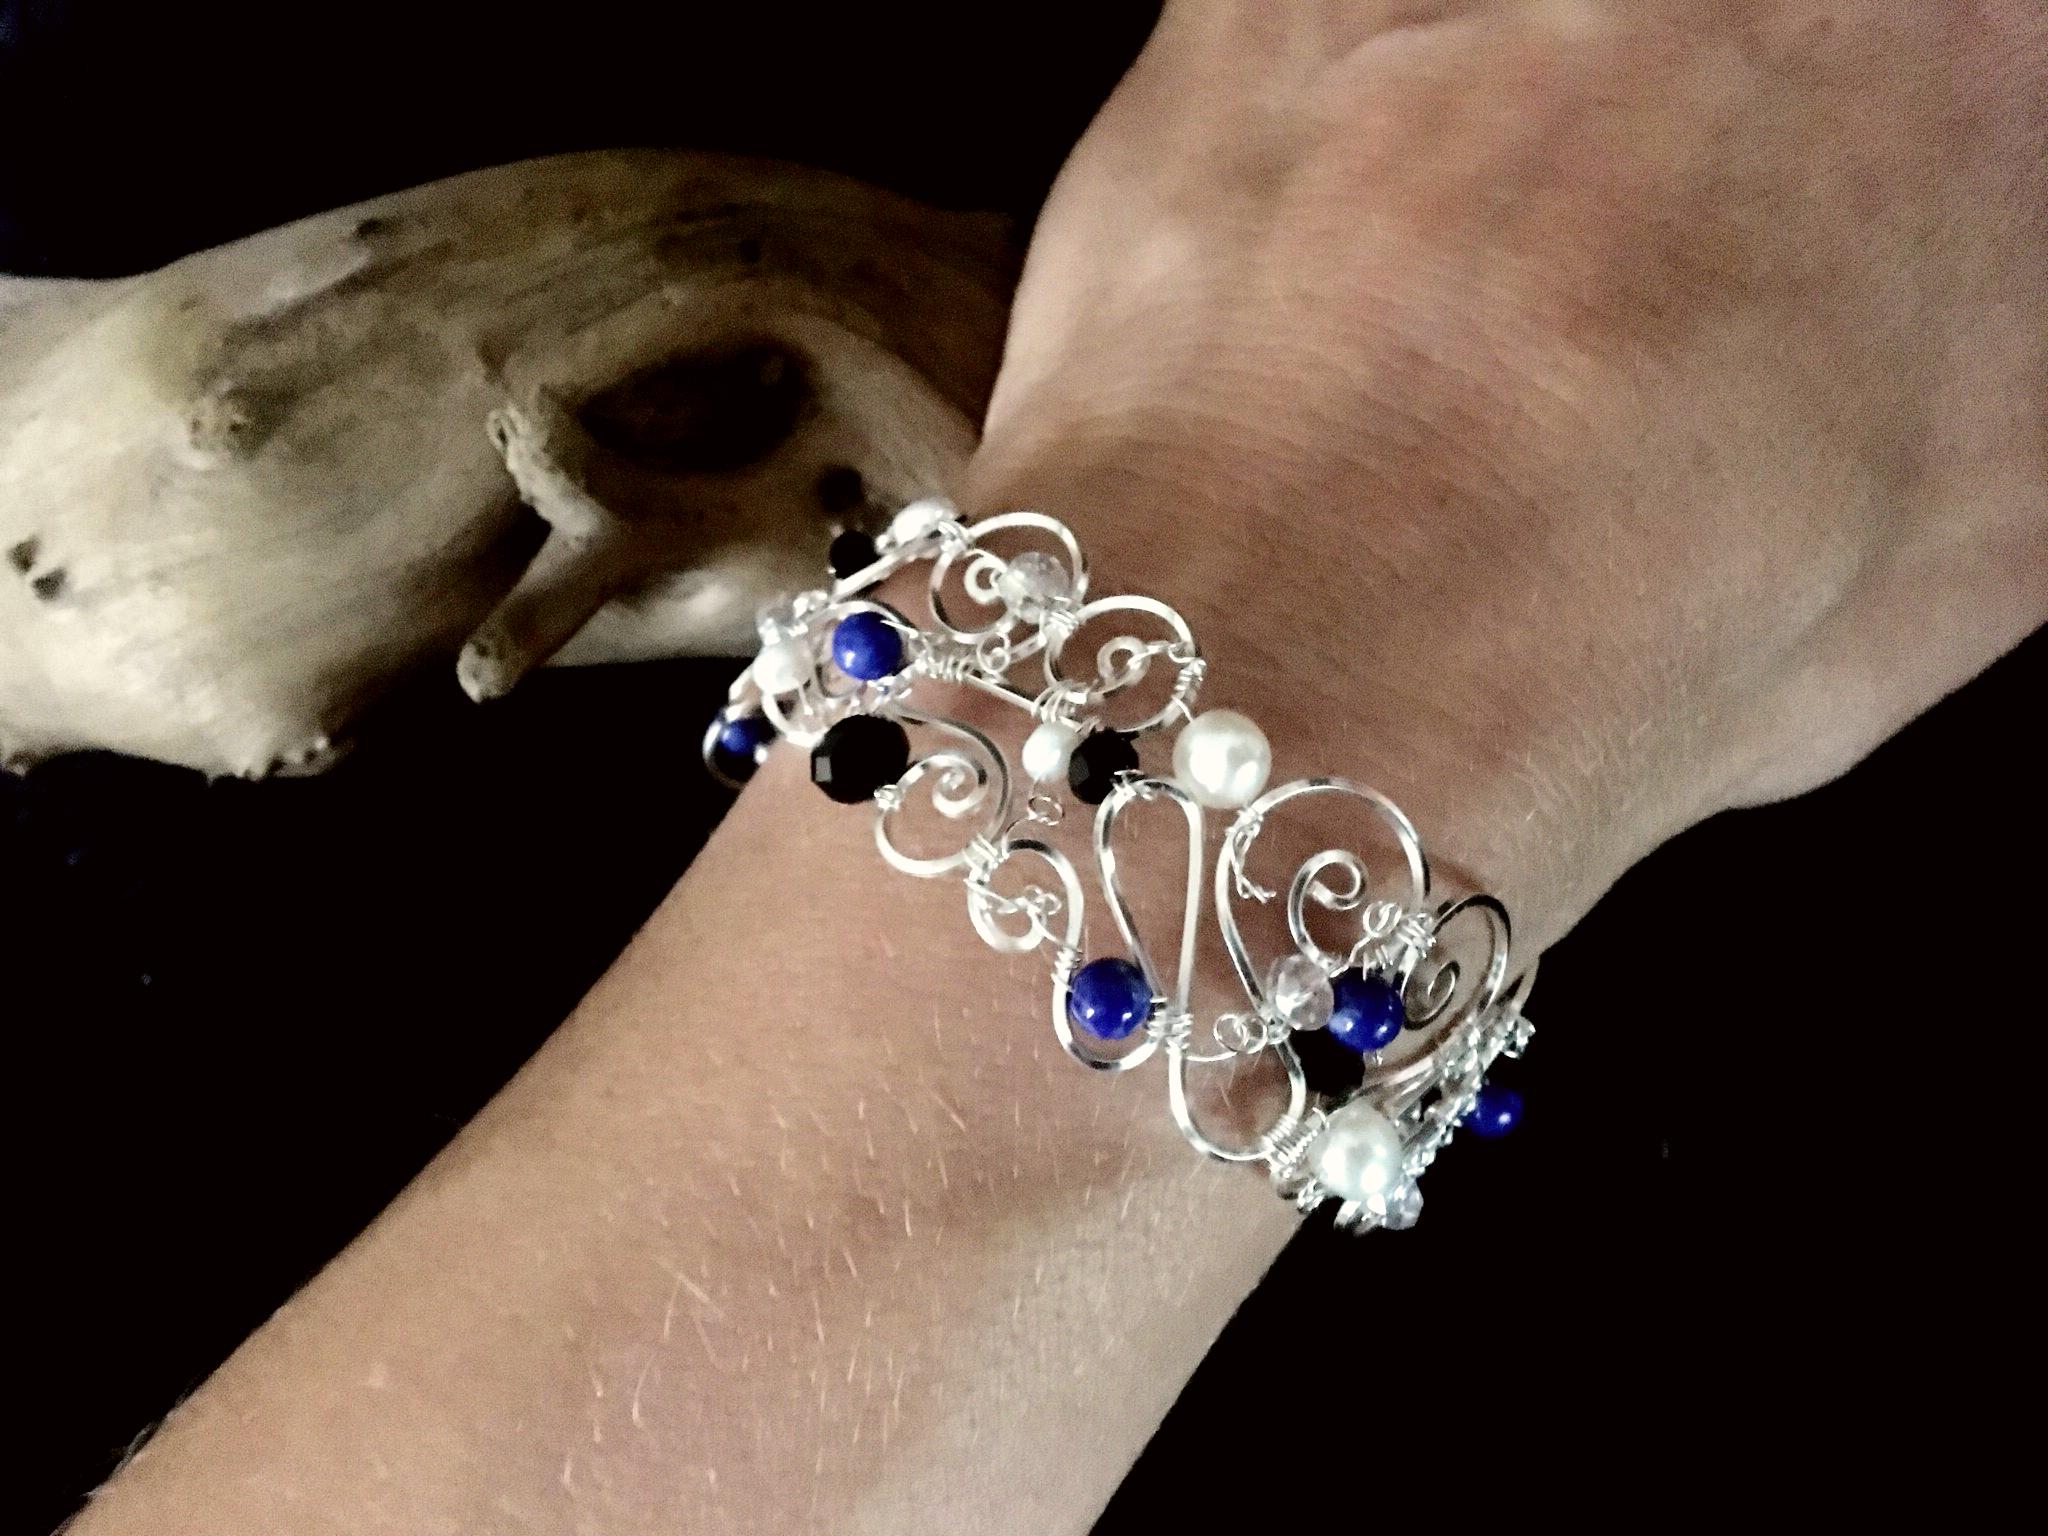 Dainty Deva Bracelet on Hand - Pearls and Lapis Lazuli - Silver Plated